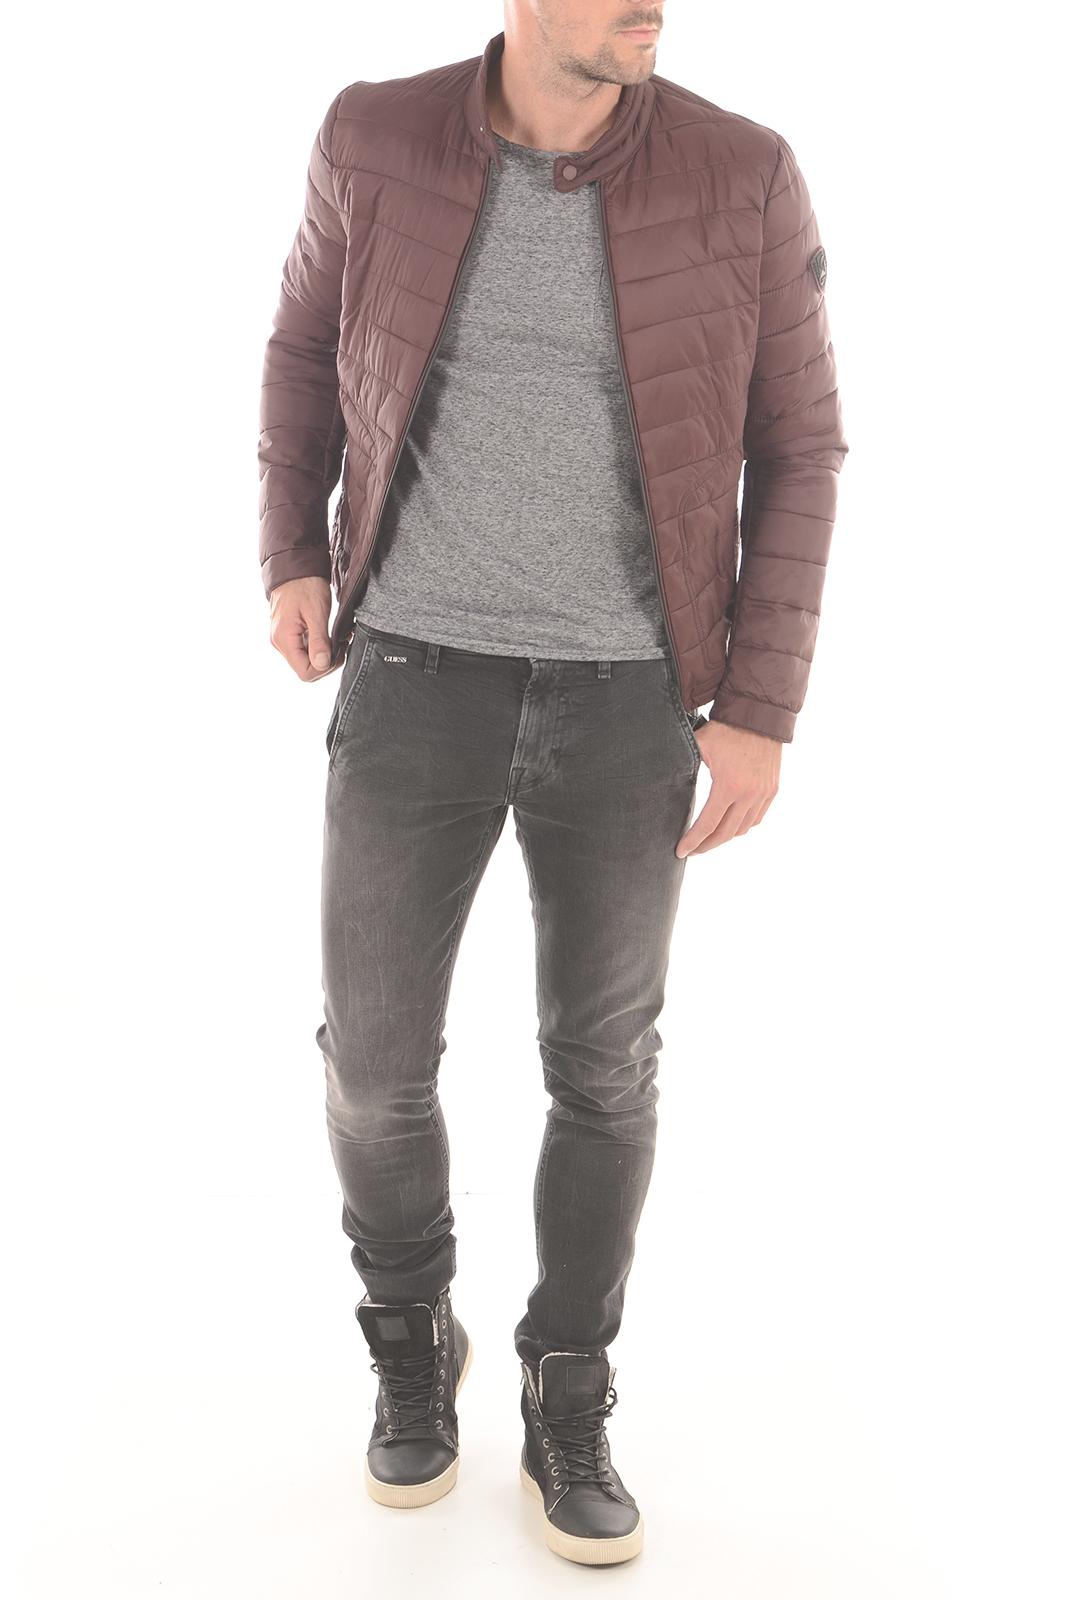 Tee-shirts  Guess jeans M63P47K4SJ0 H098 GRIS